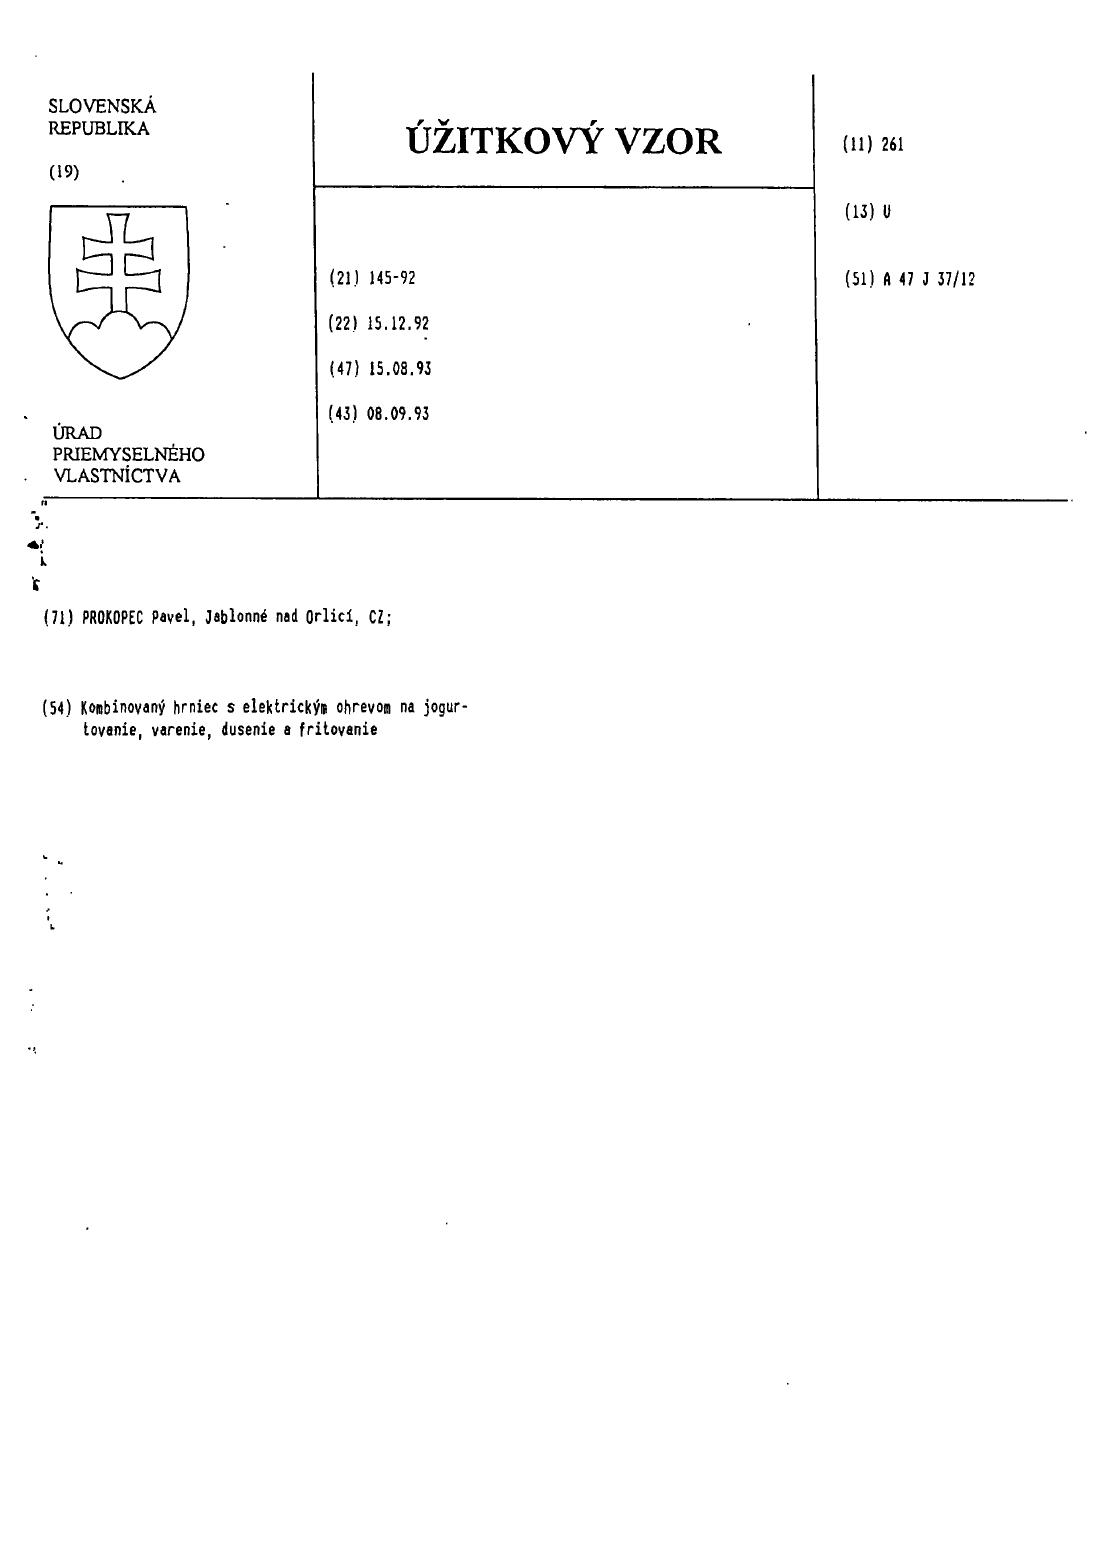 Kondenzacna Pokrievka 05 03 2002 U 3152 Databaza Patentov